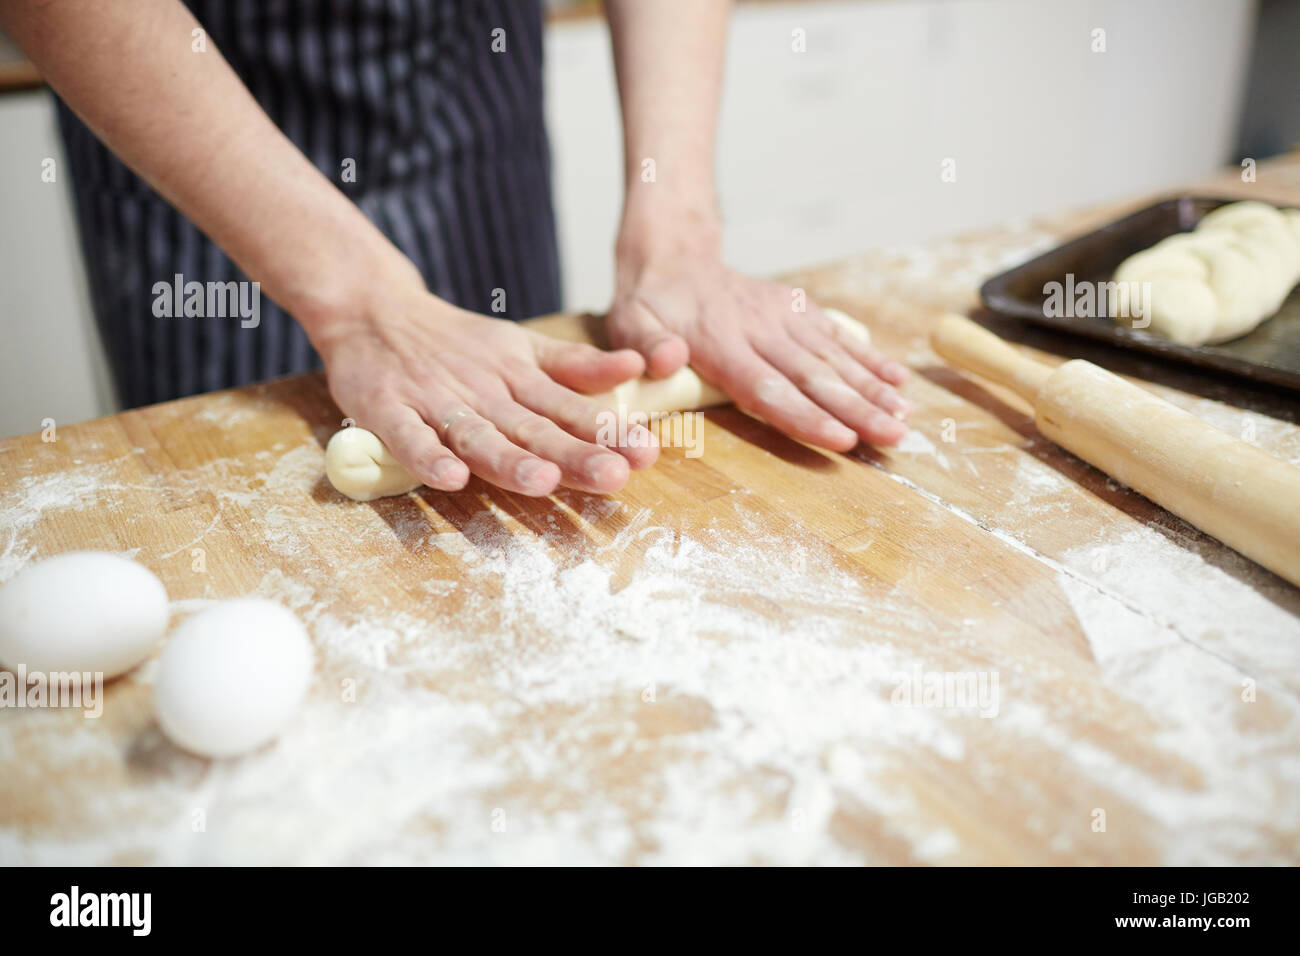 Making buns - Stock Image